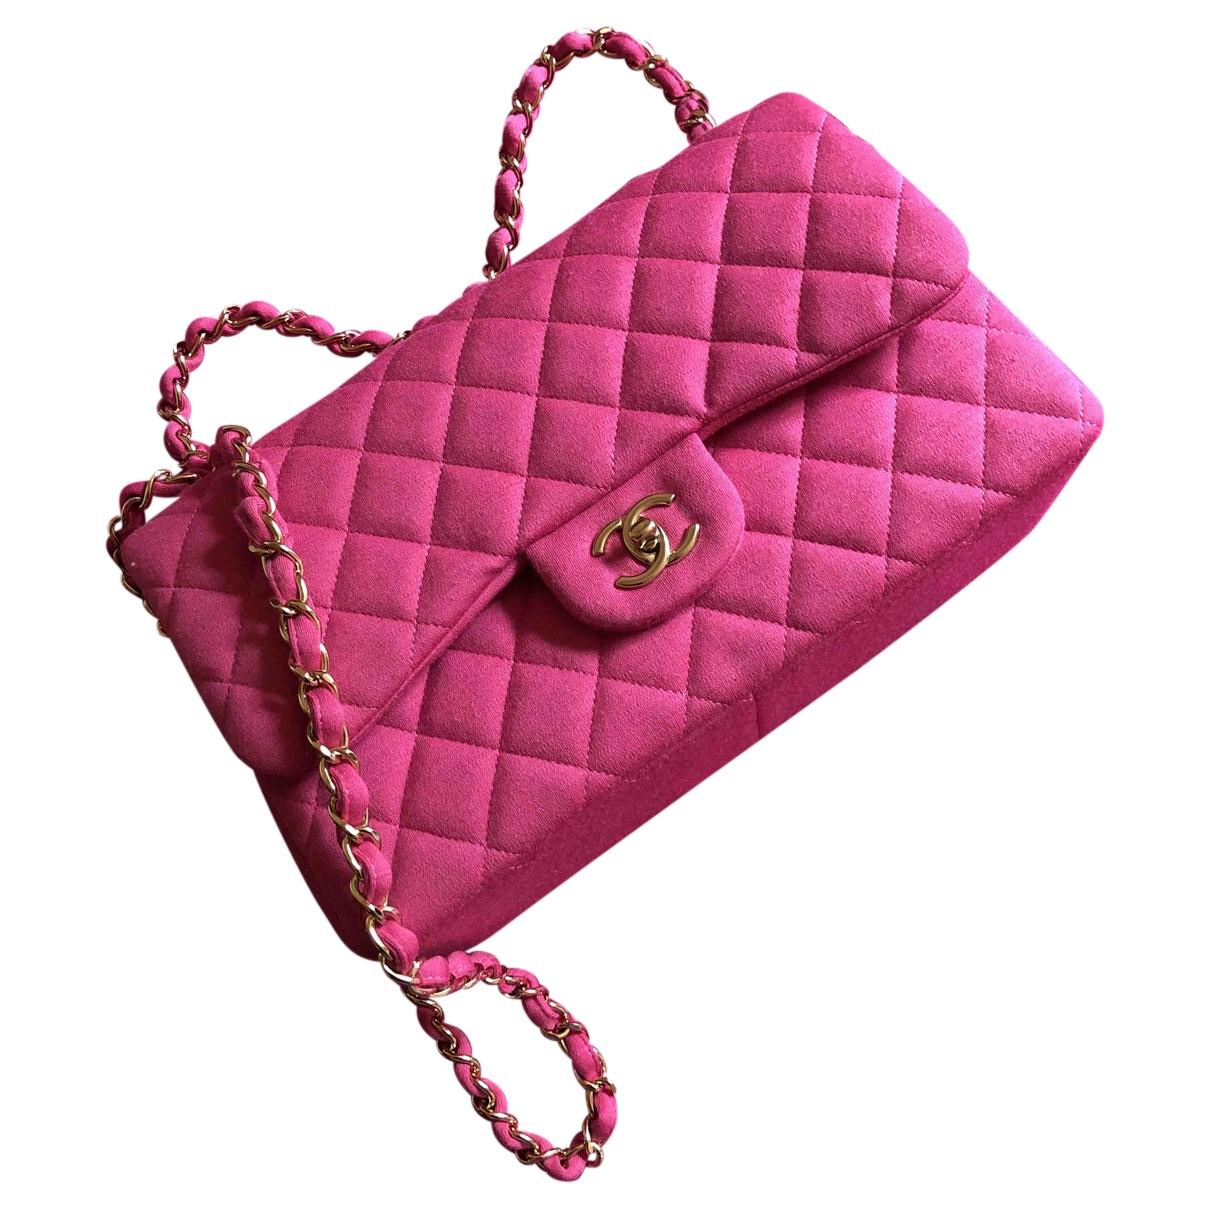 Chanel Timeless/Classique Handtasche in  Rosa Baumwolle